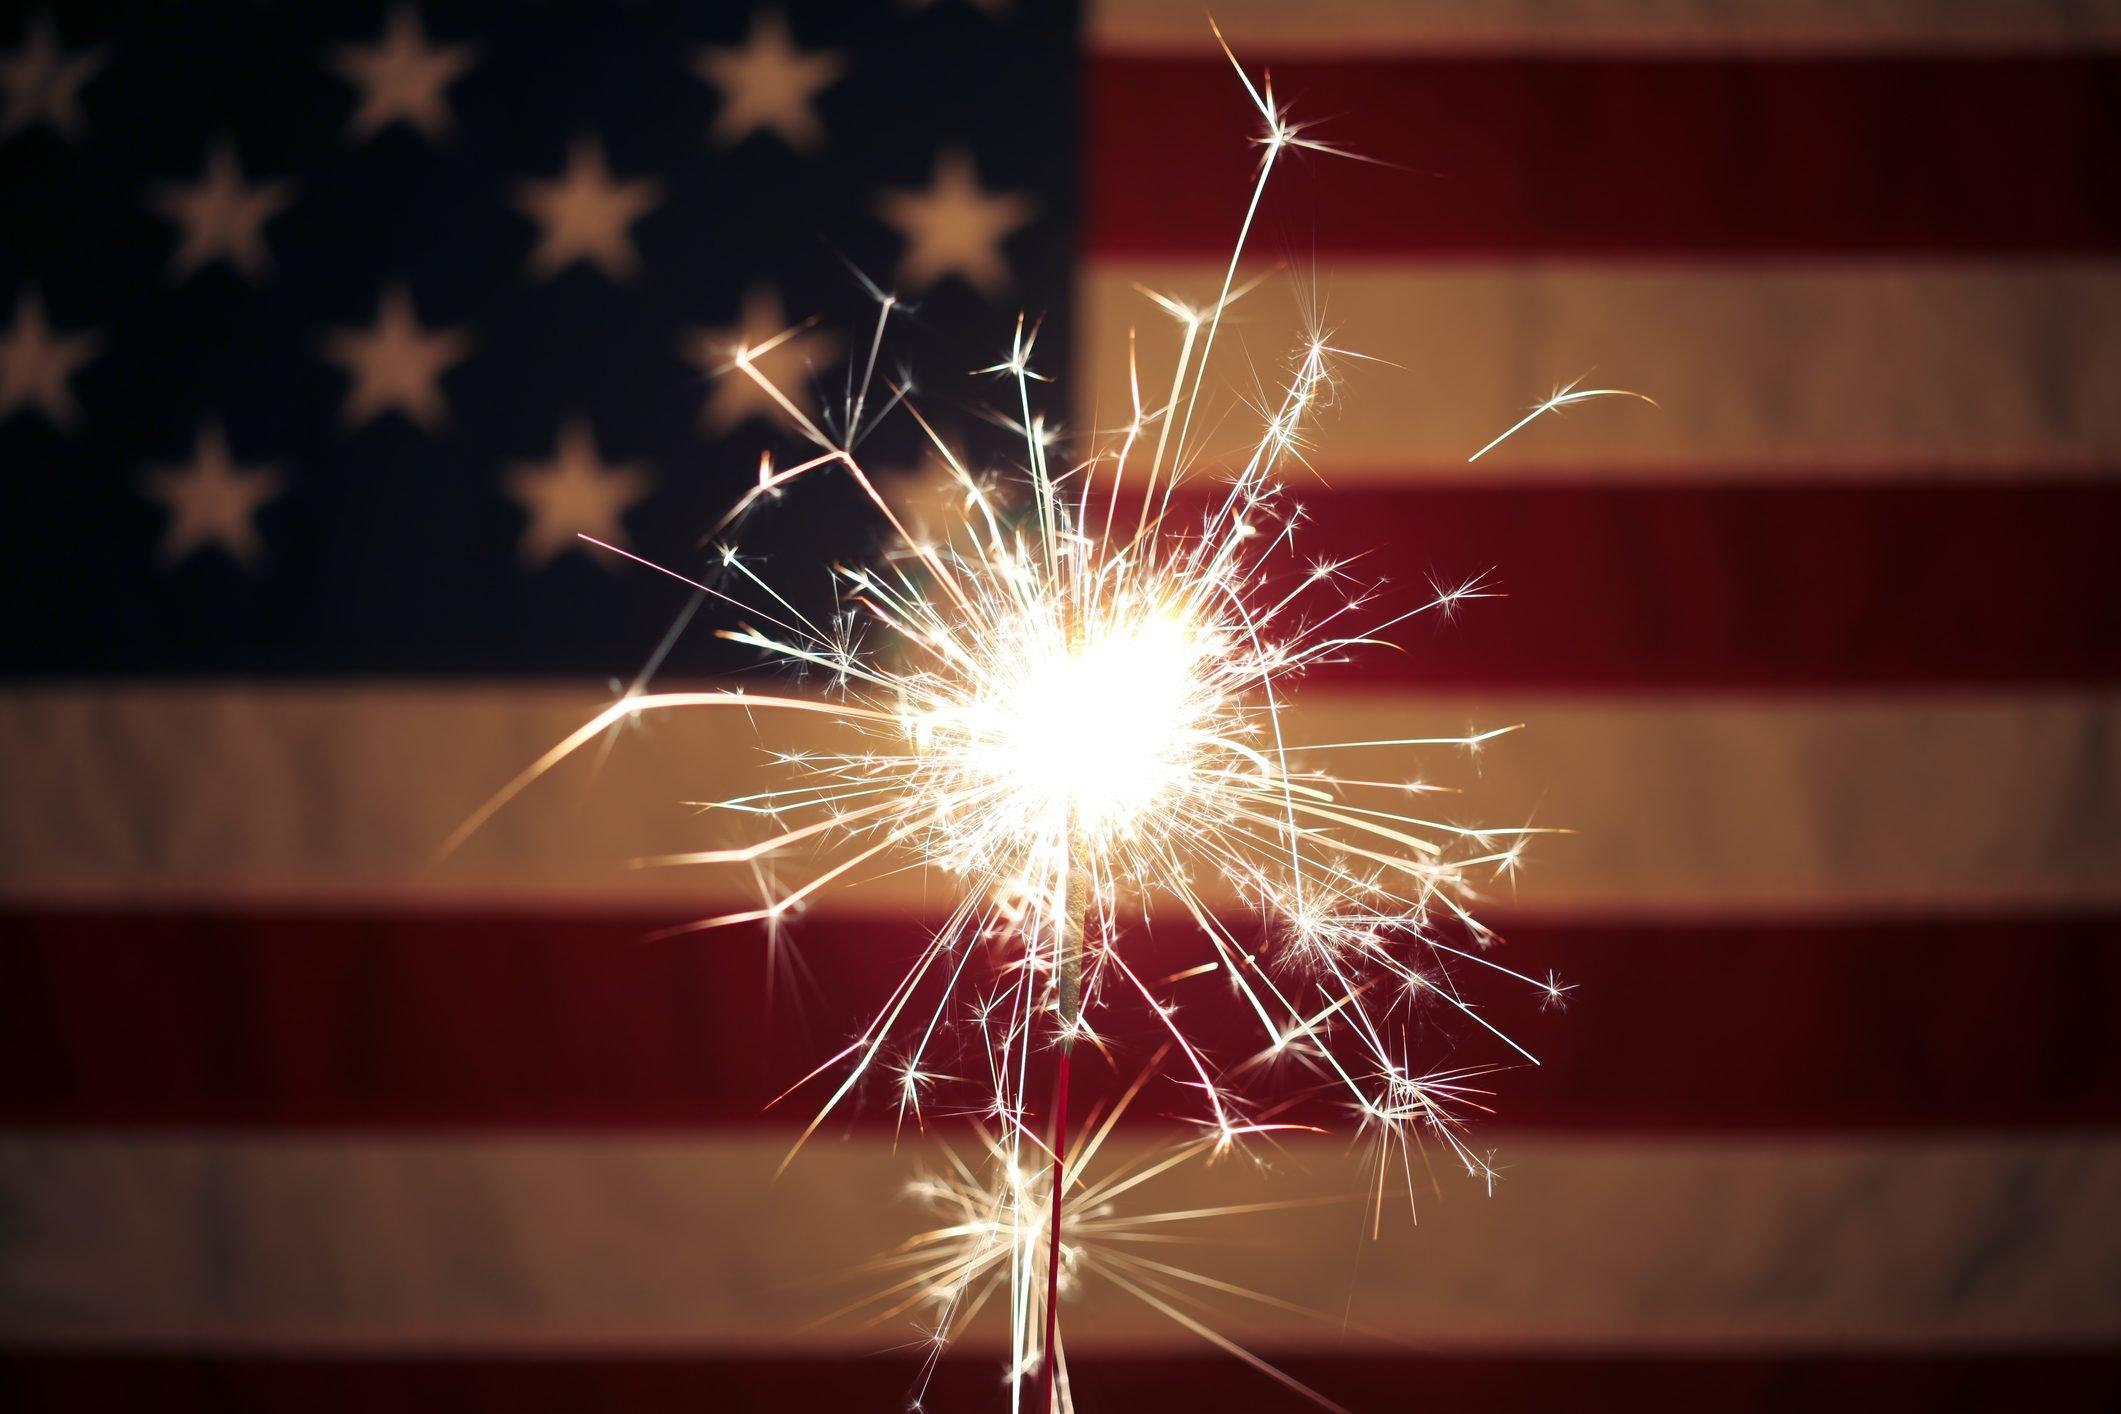 Lit sparkler in front the American Flag for 4th of July celebration